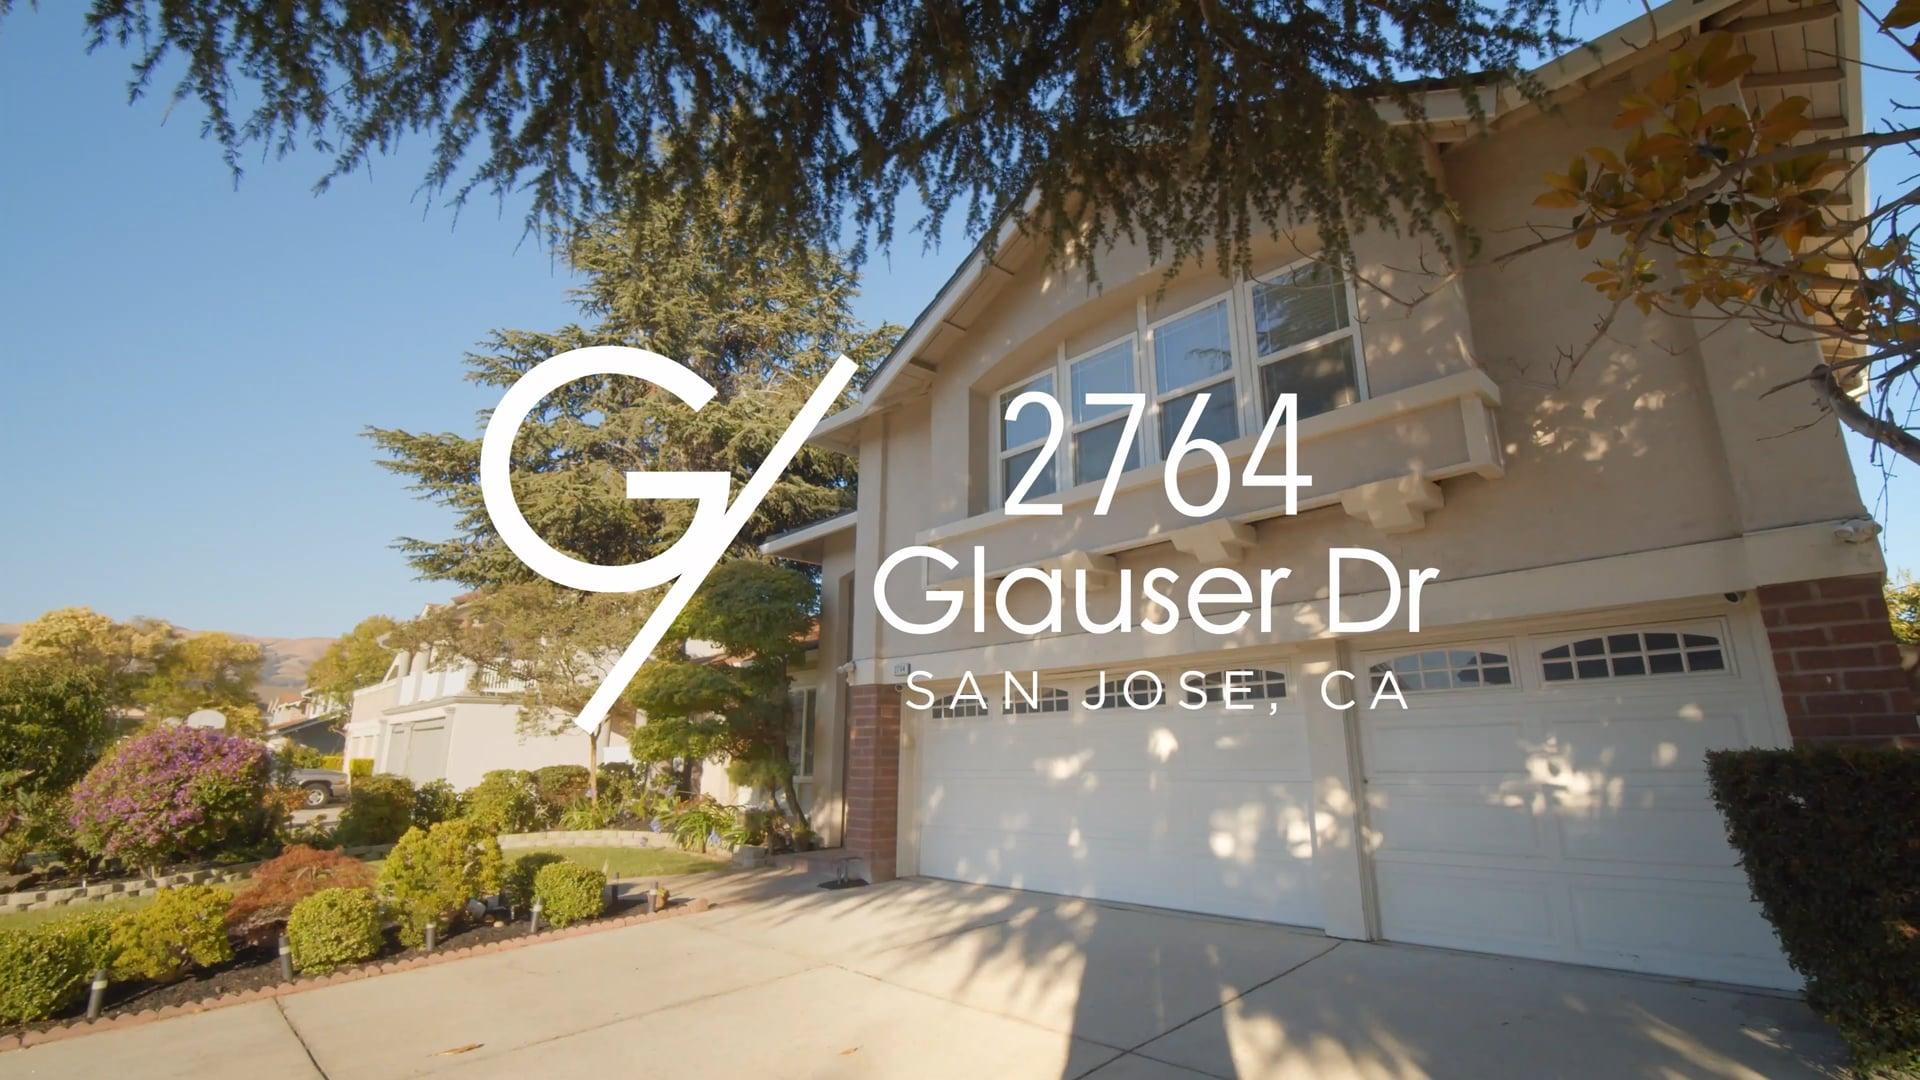 2764 Glauser Dr, San Jose, CA   Mike Bui   EQ1 Real Estate